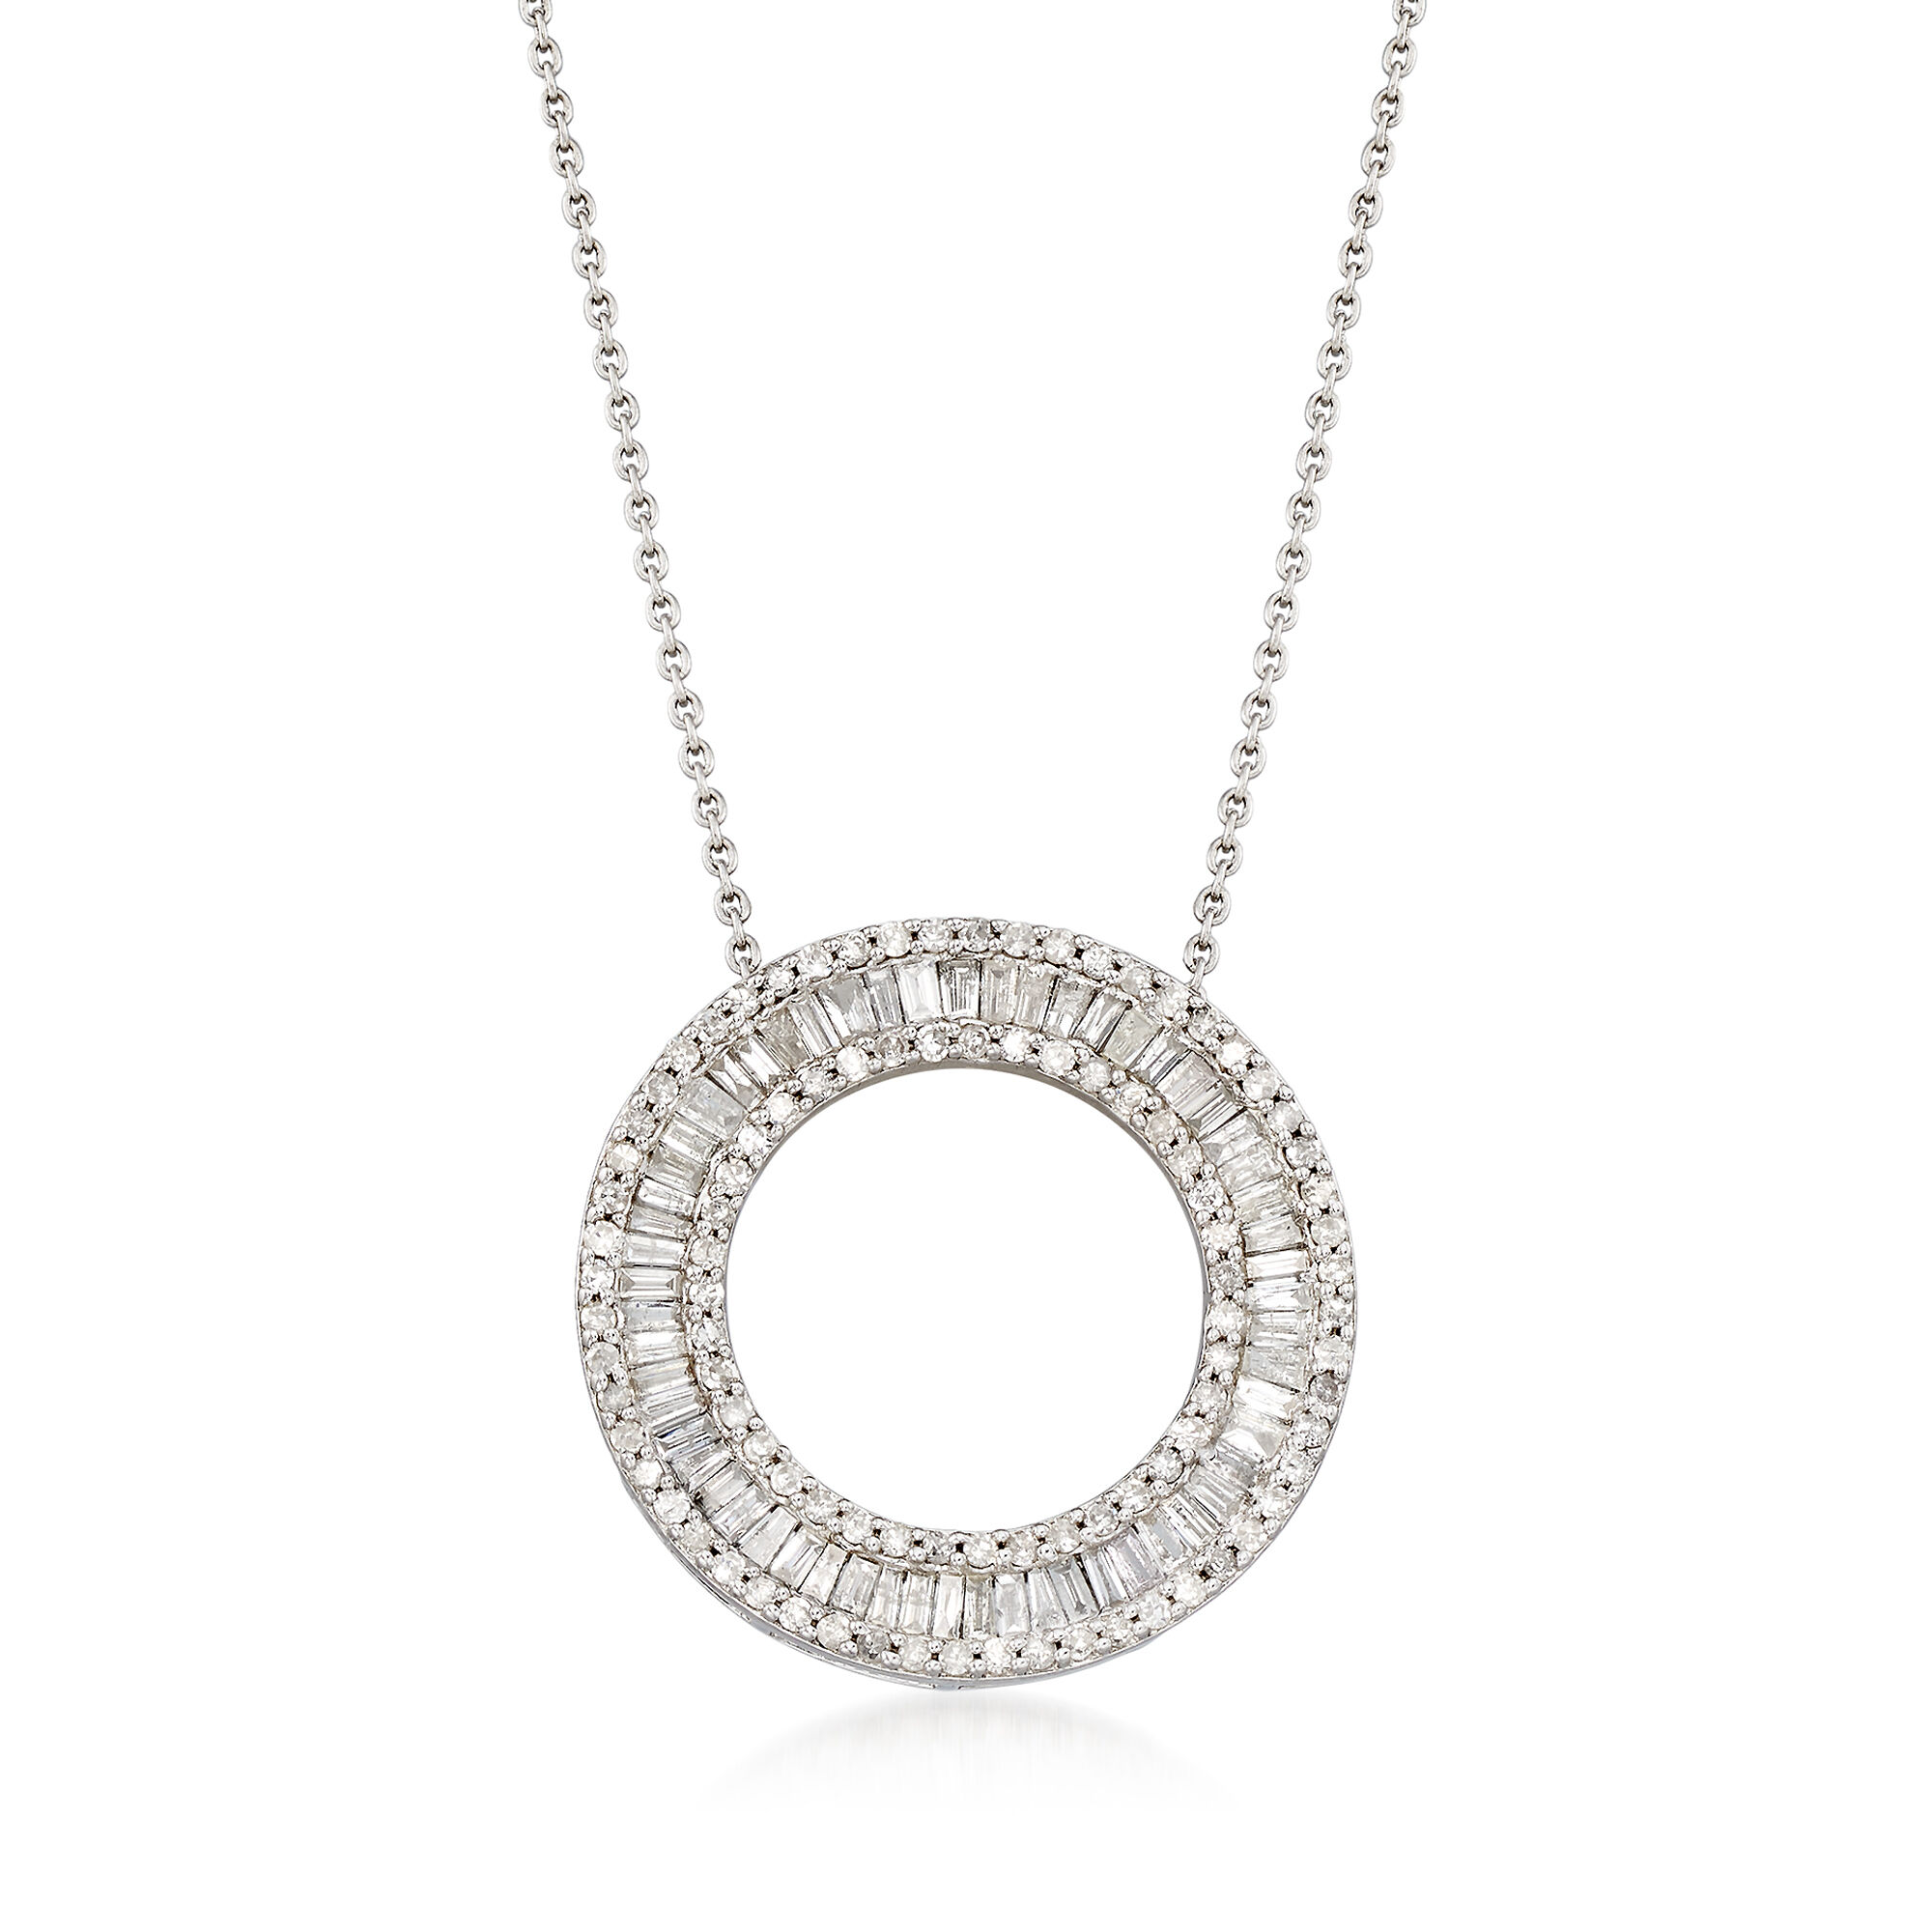 DiamondJewelryNY Silver Pendant Ss Pnk Whte//Long Lgnth Neck 36